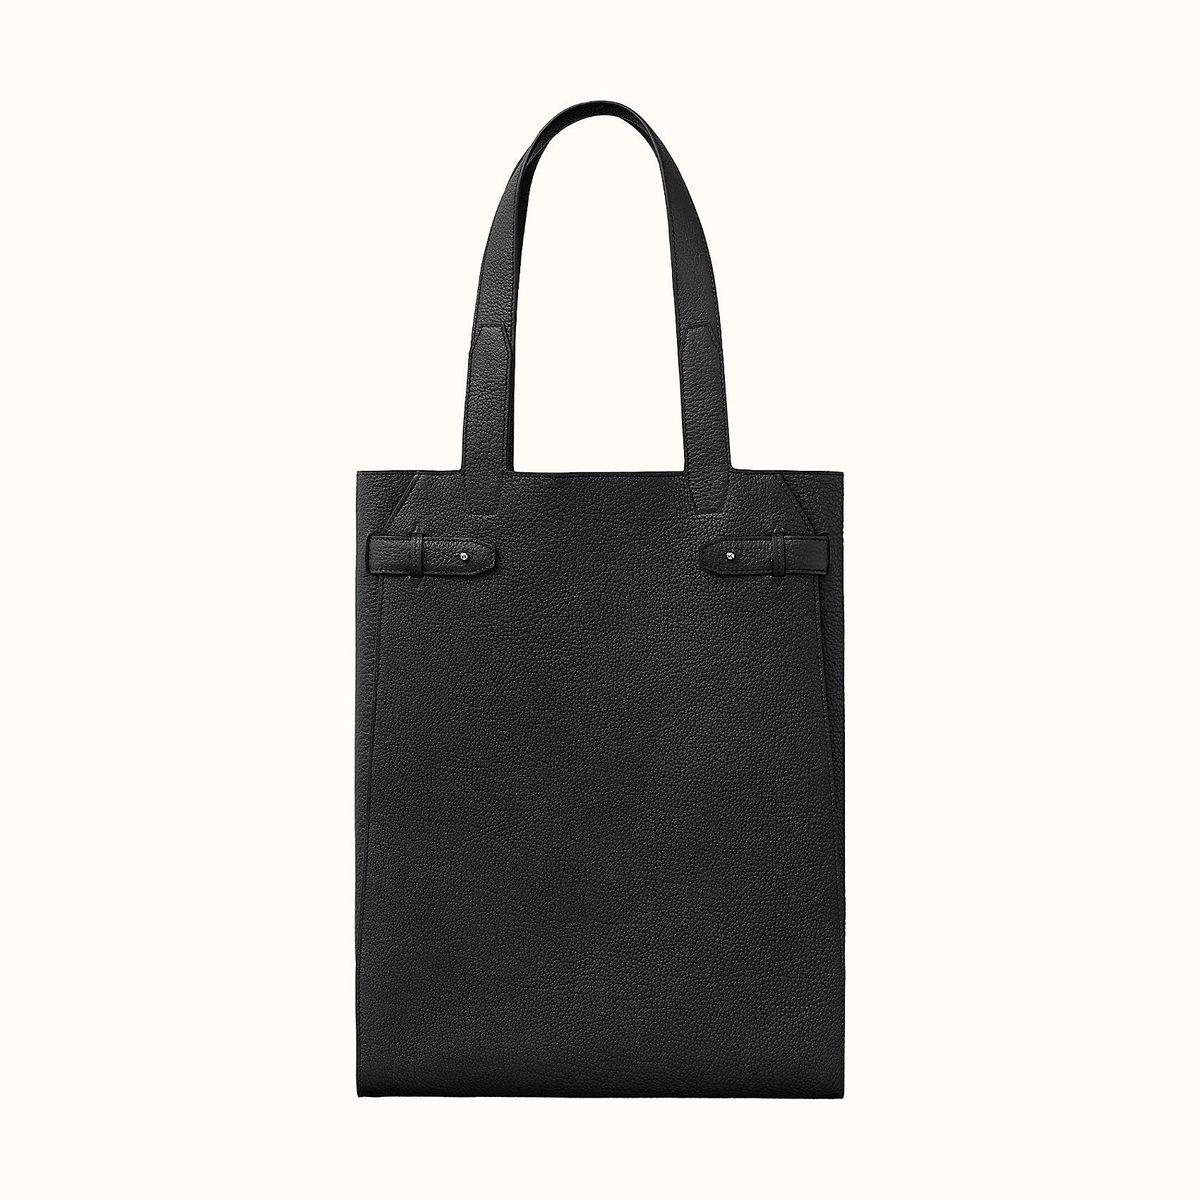 Cabavertige Bag